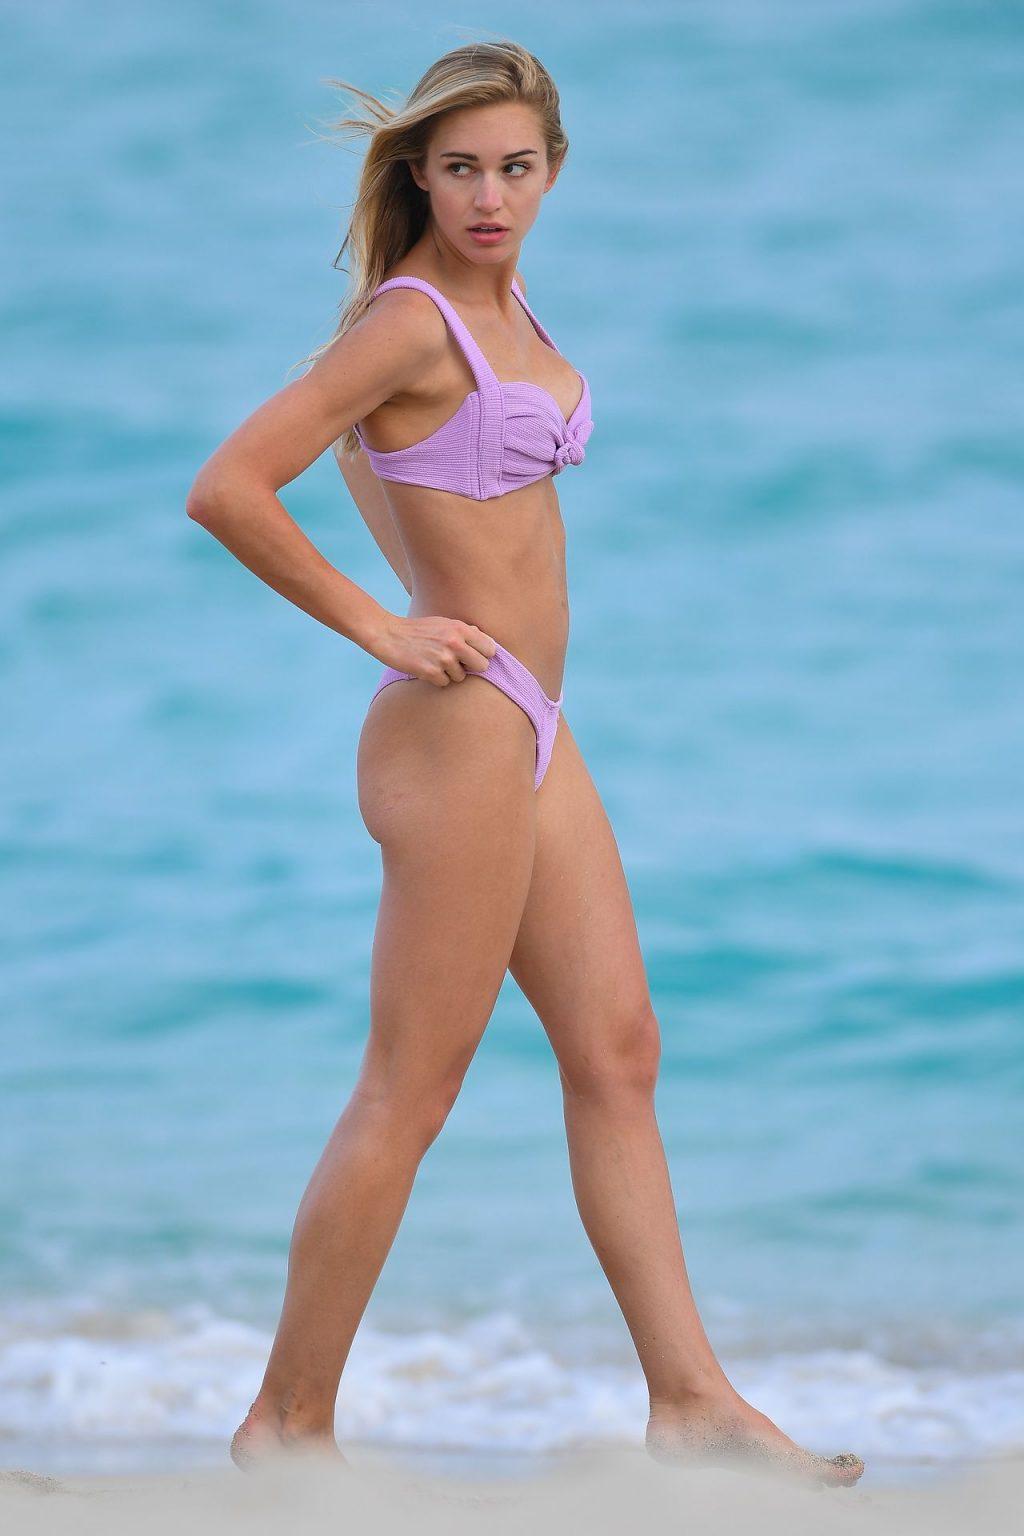 Model Gilda Joelle Osborn Looks Hot in Miami Beach (20 Photos)